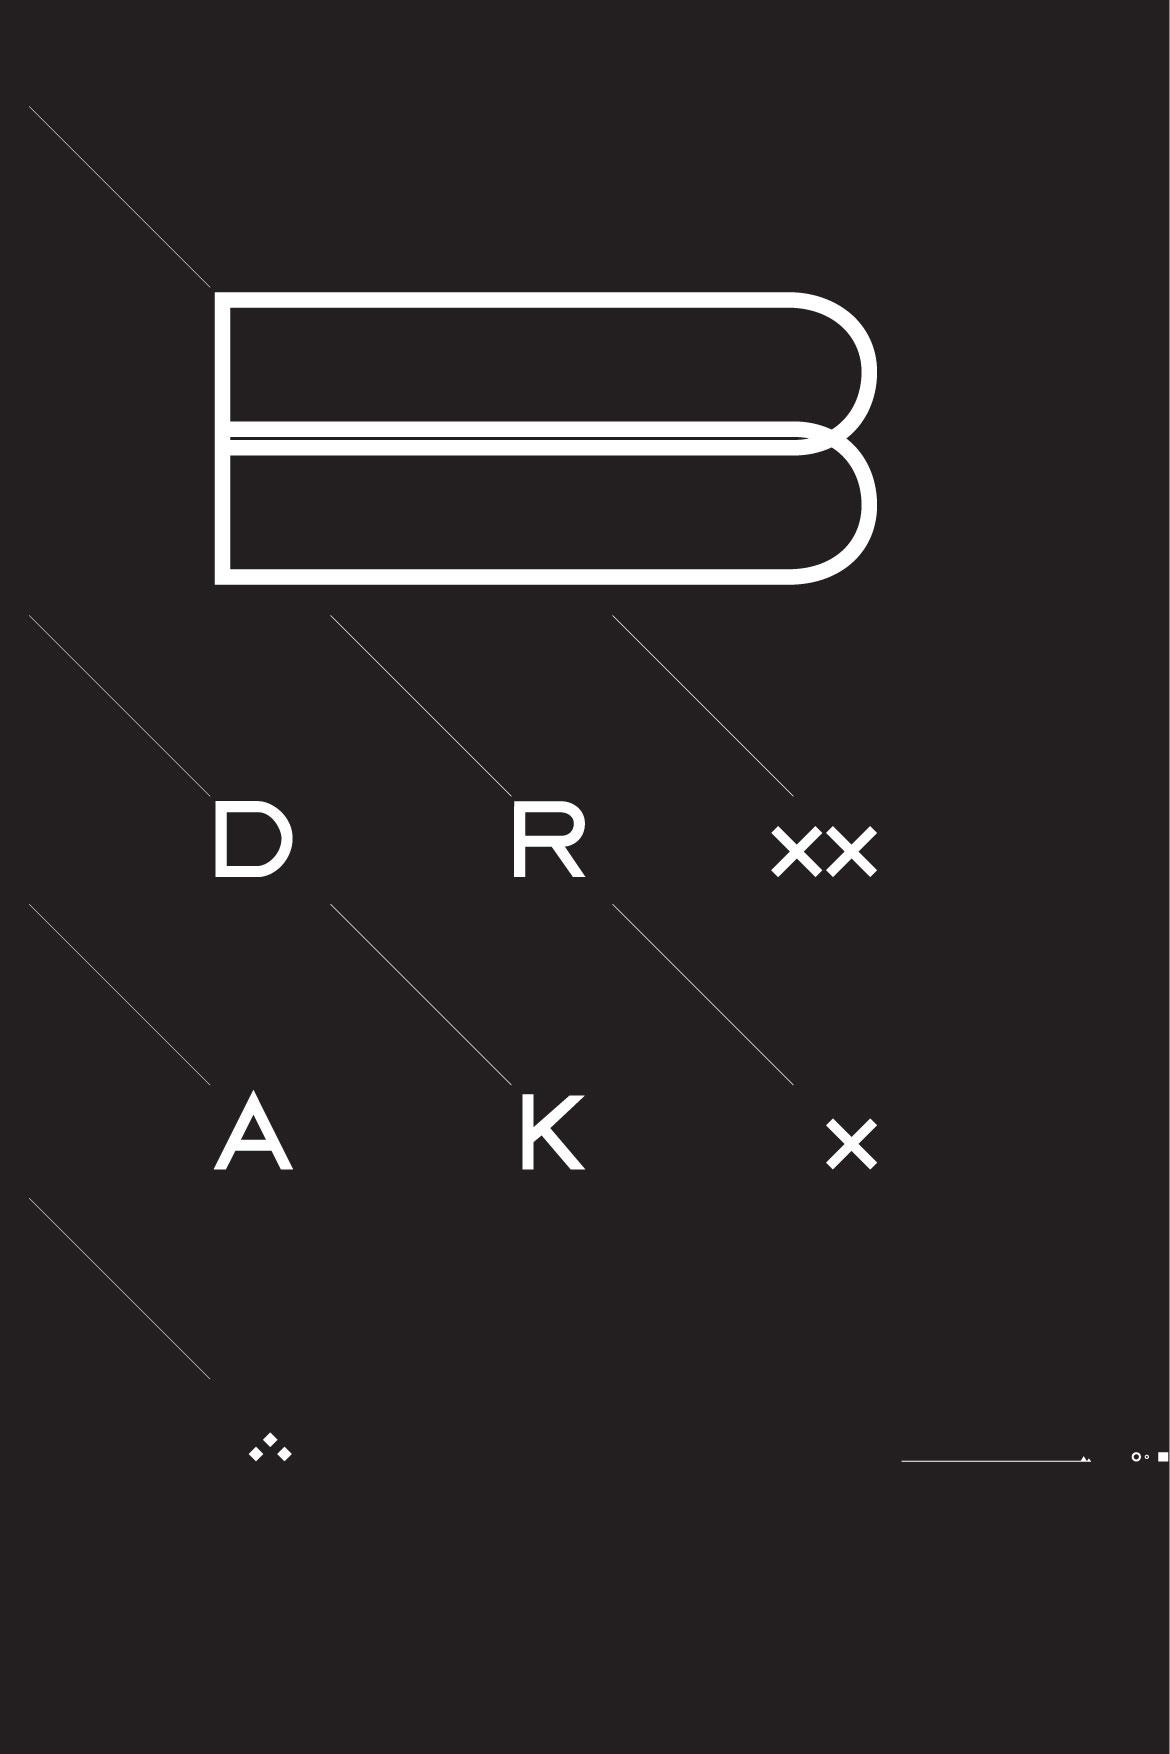 BeDARK Typeface